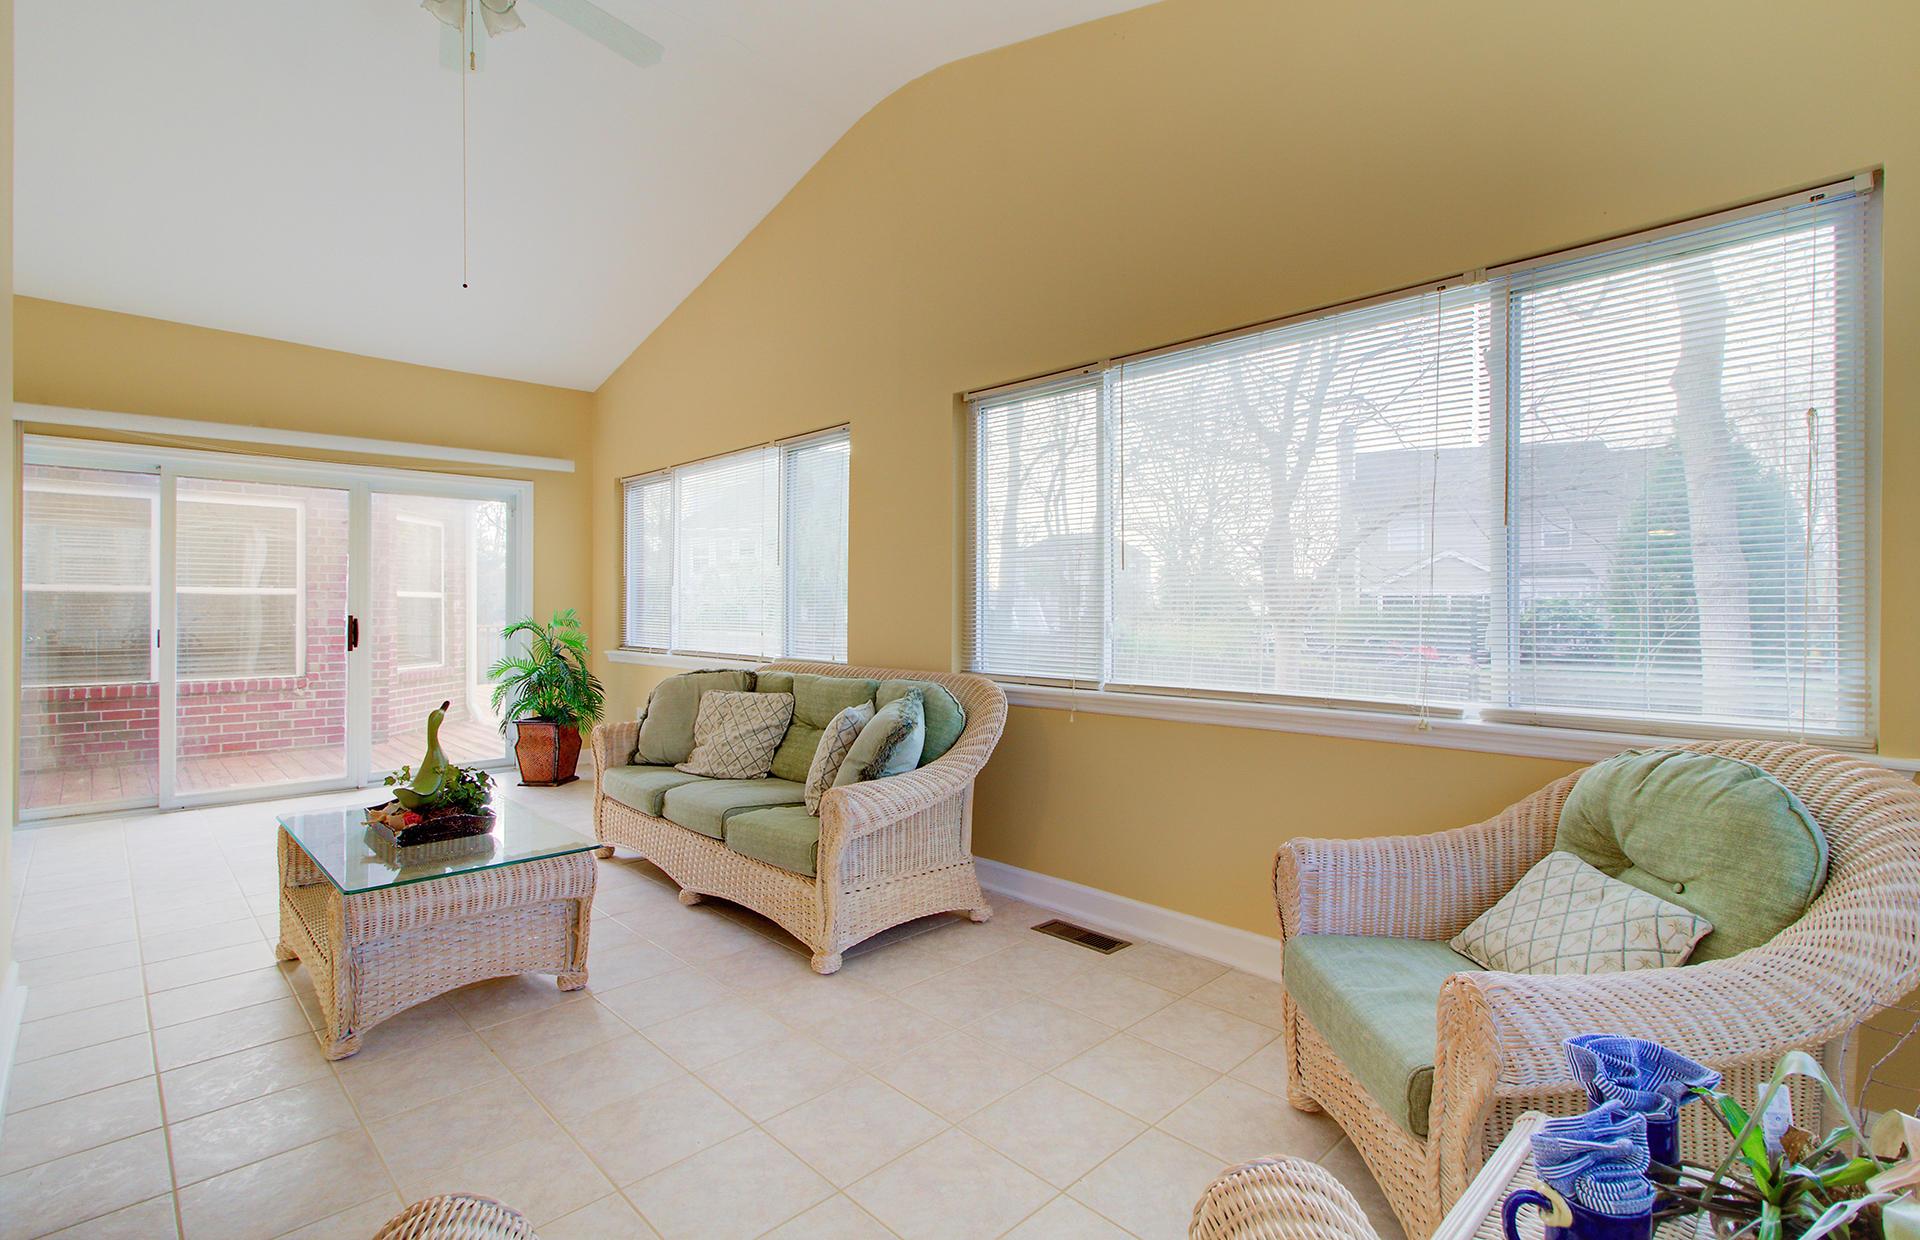 Bakers Landing Homes For Sale - 105 River Oak, North Charleston, SC - 15